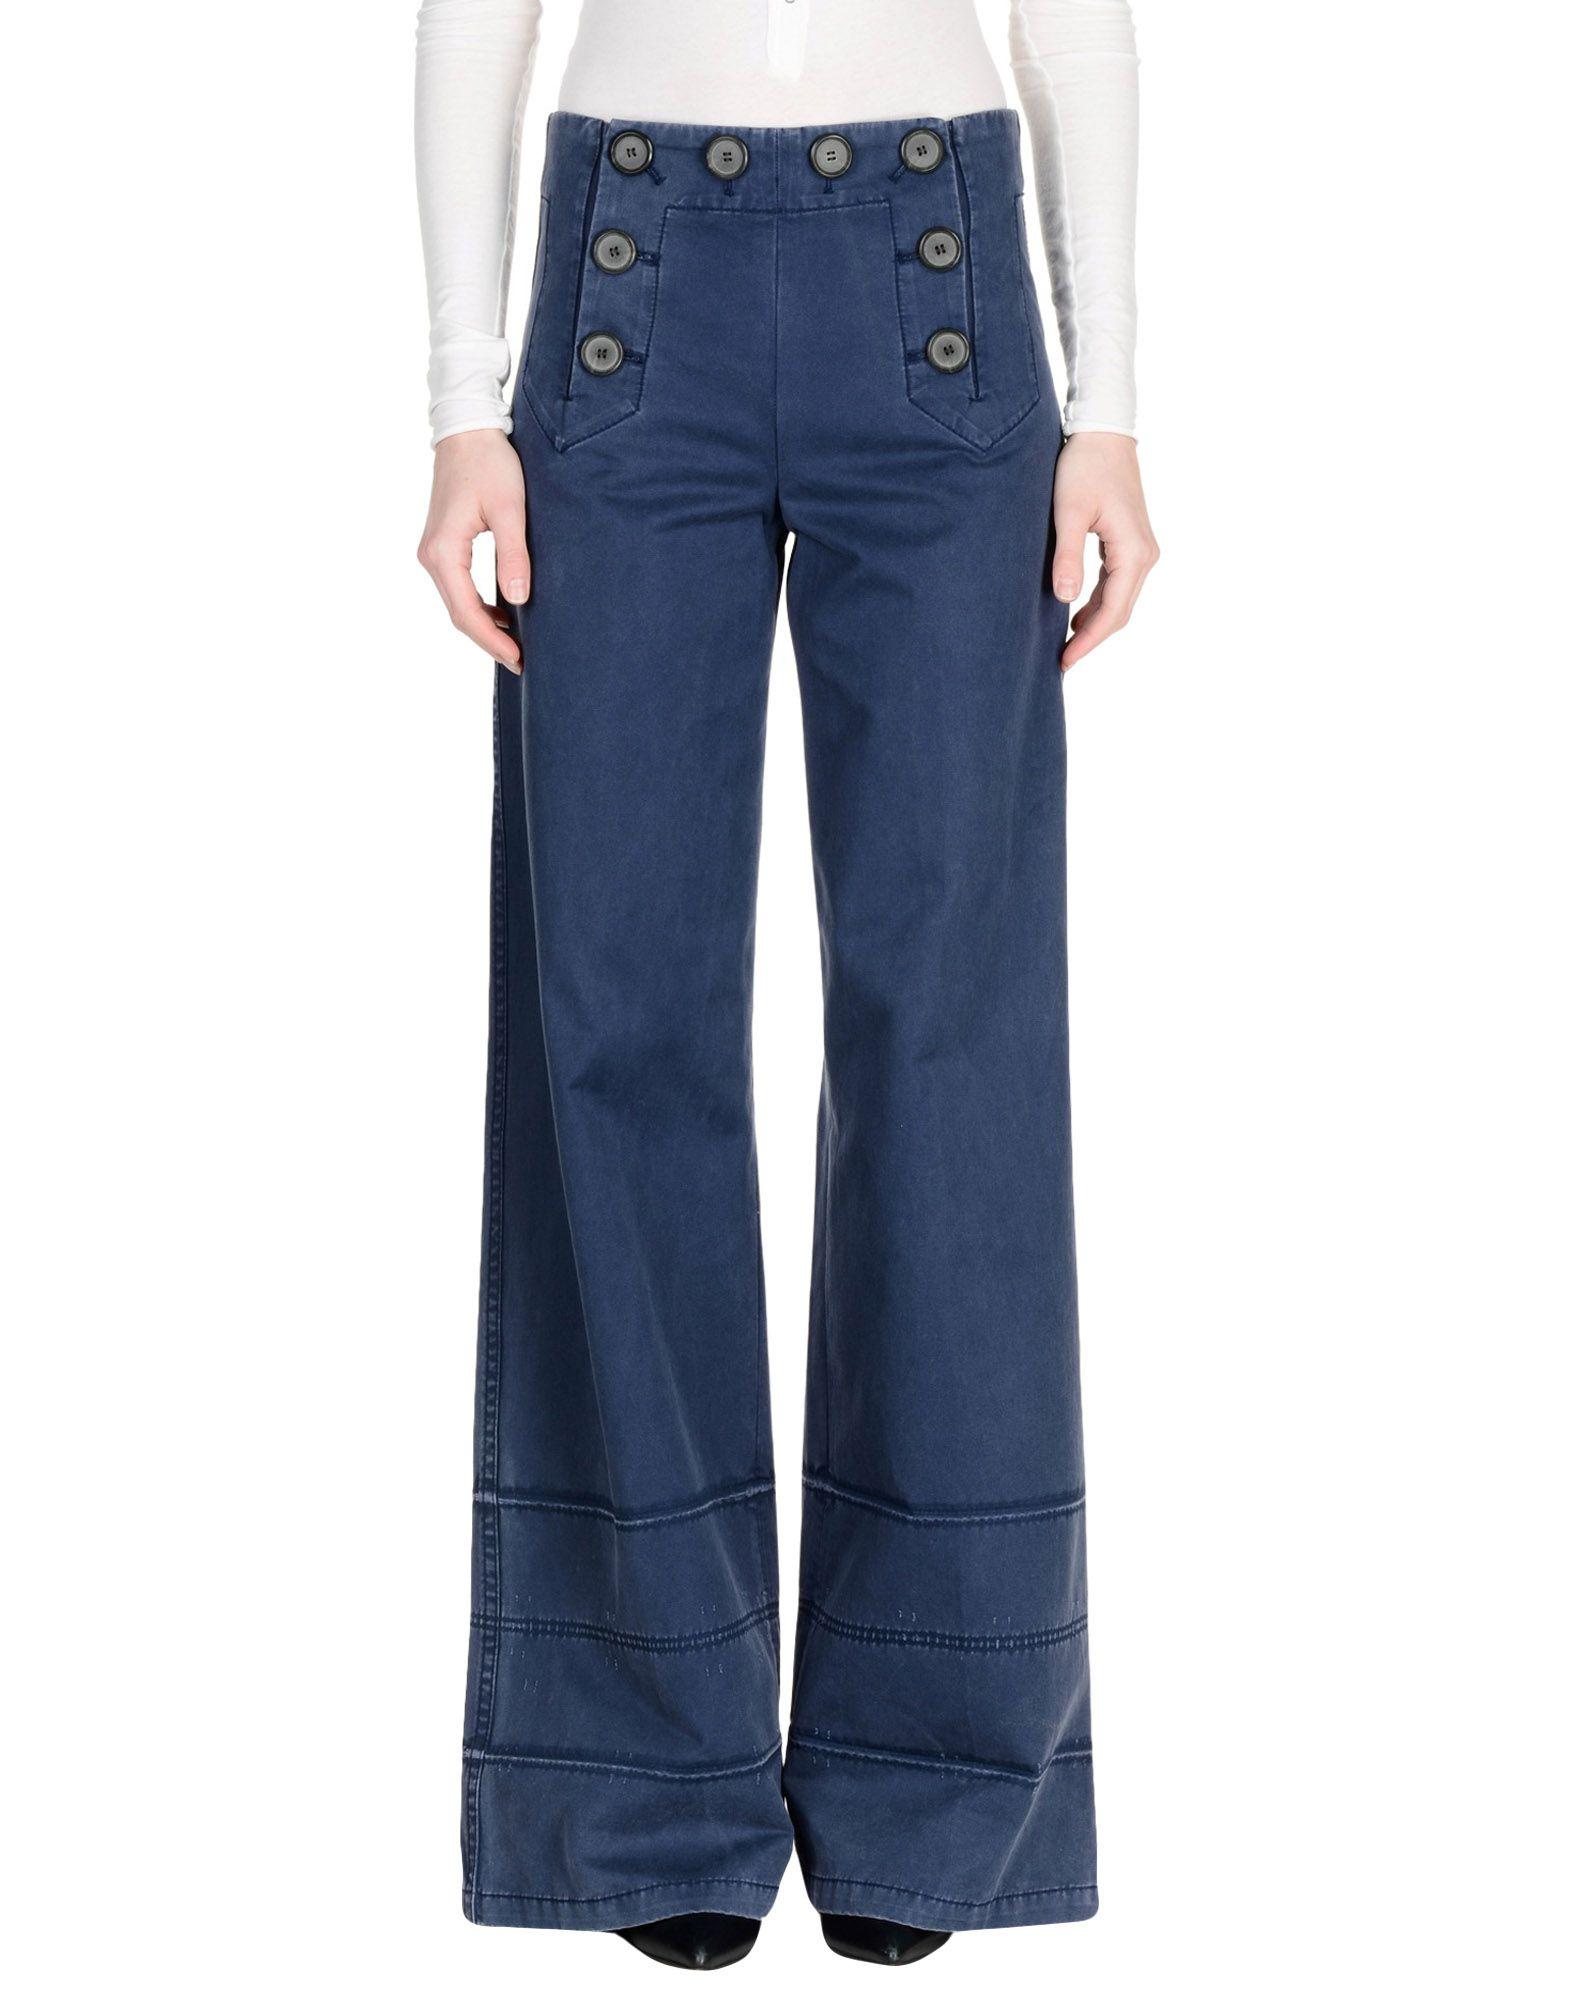 MARC BY JACOBS Damen Hose Farbe Taubenblau Größe 2